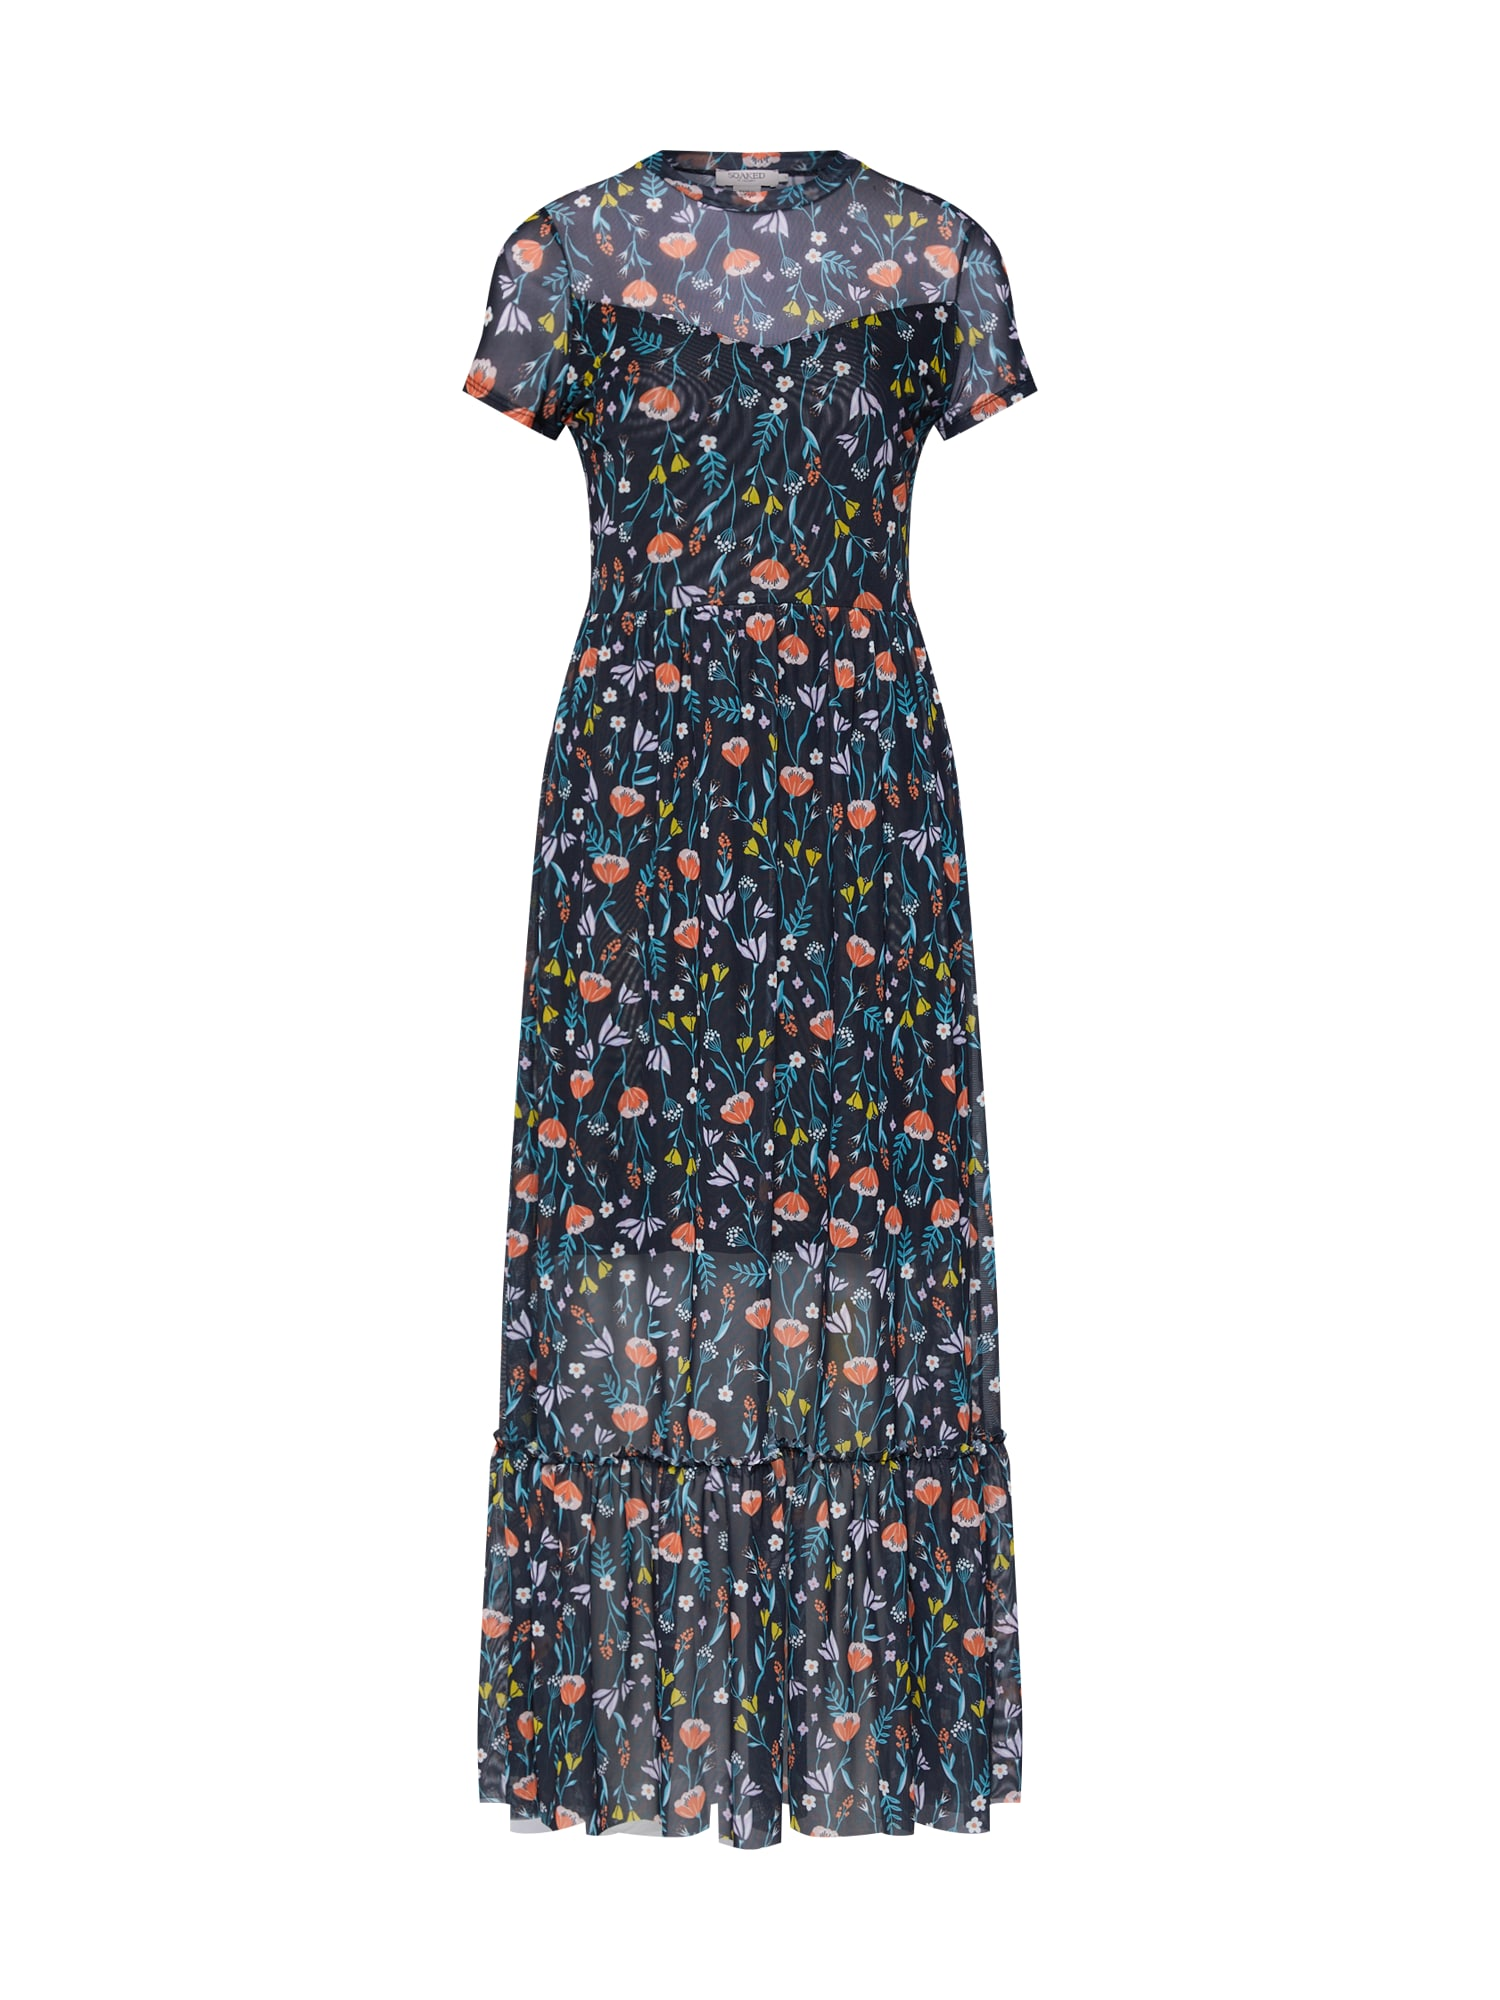 Šaty Ariane mix barev černá SOAKED IN LUXURY